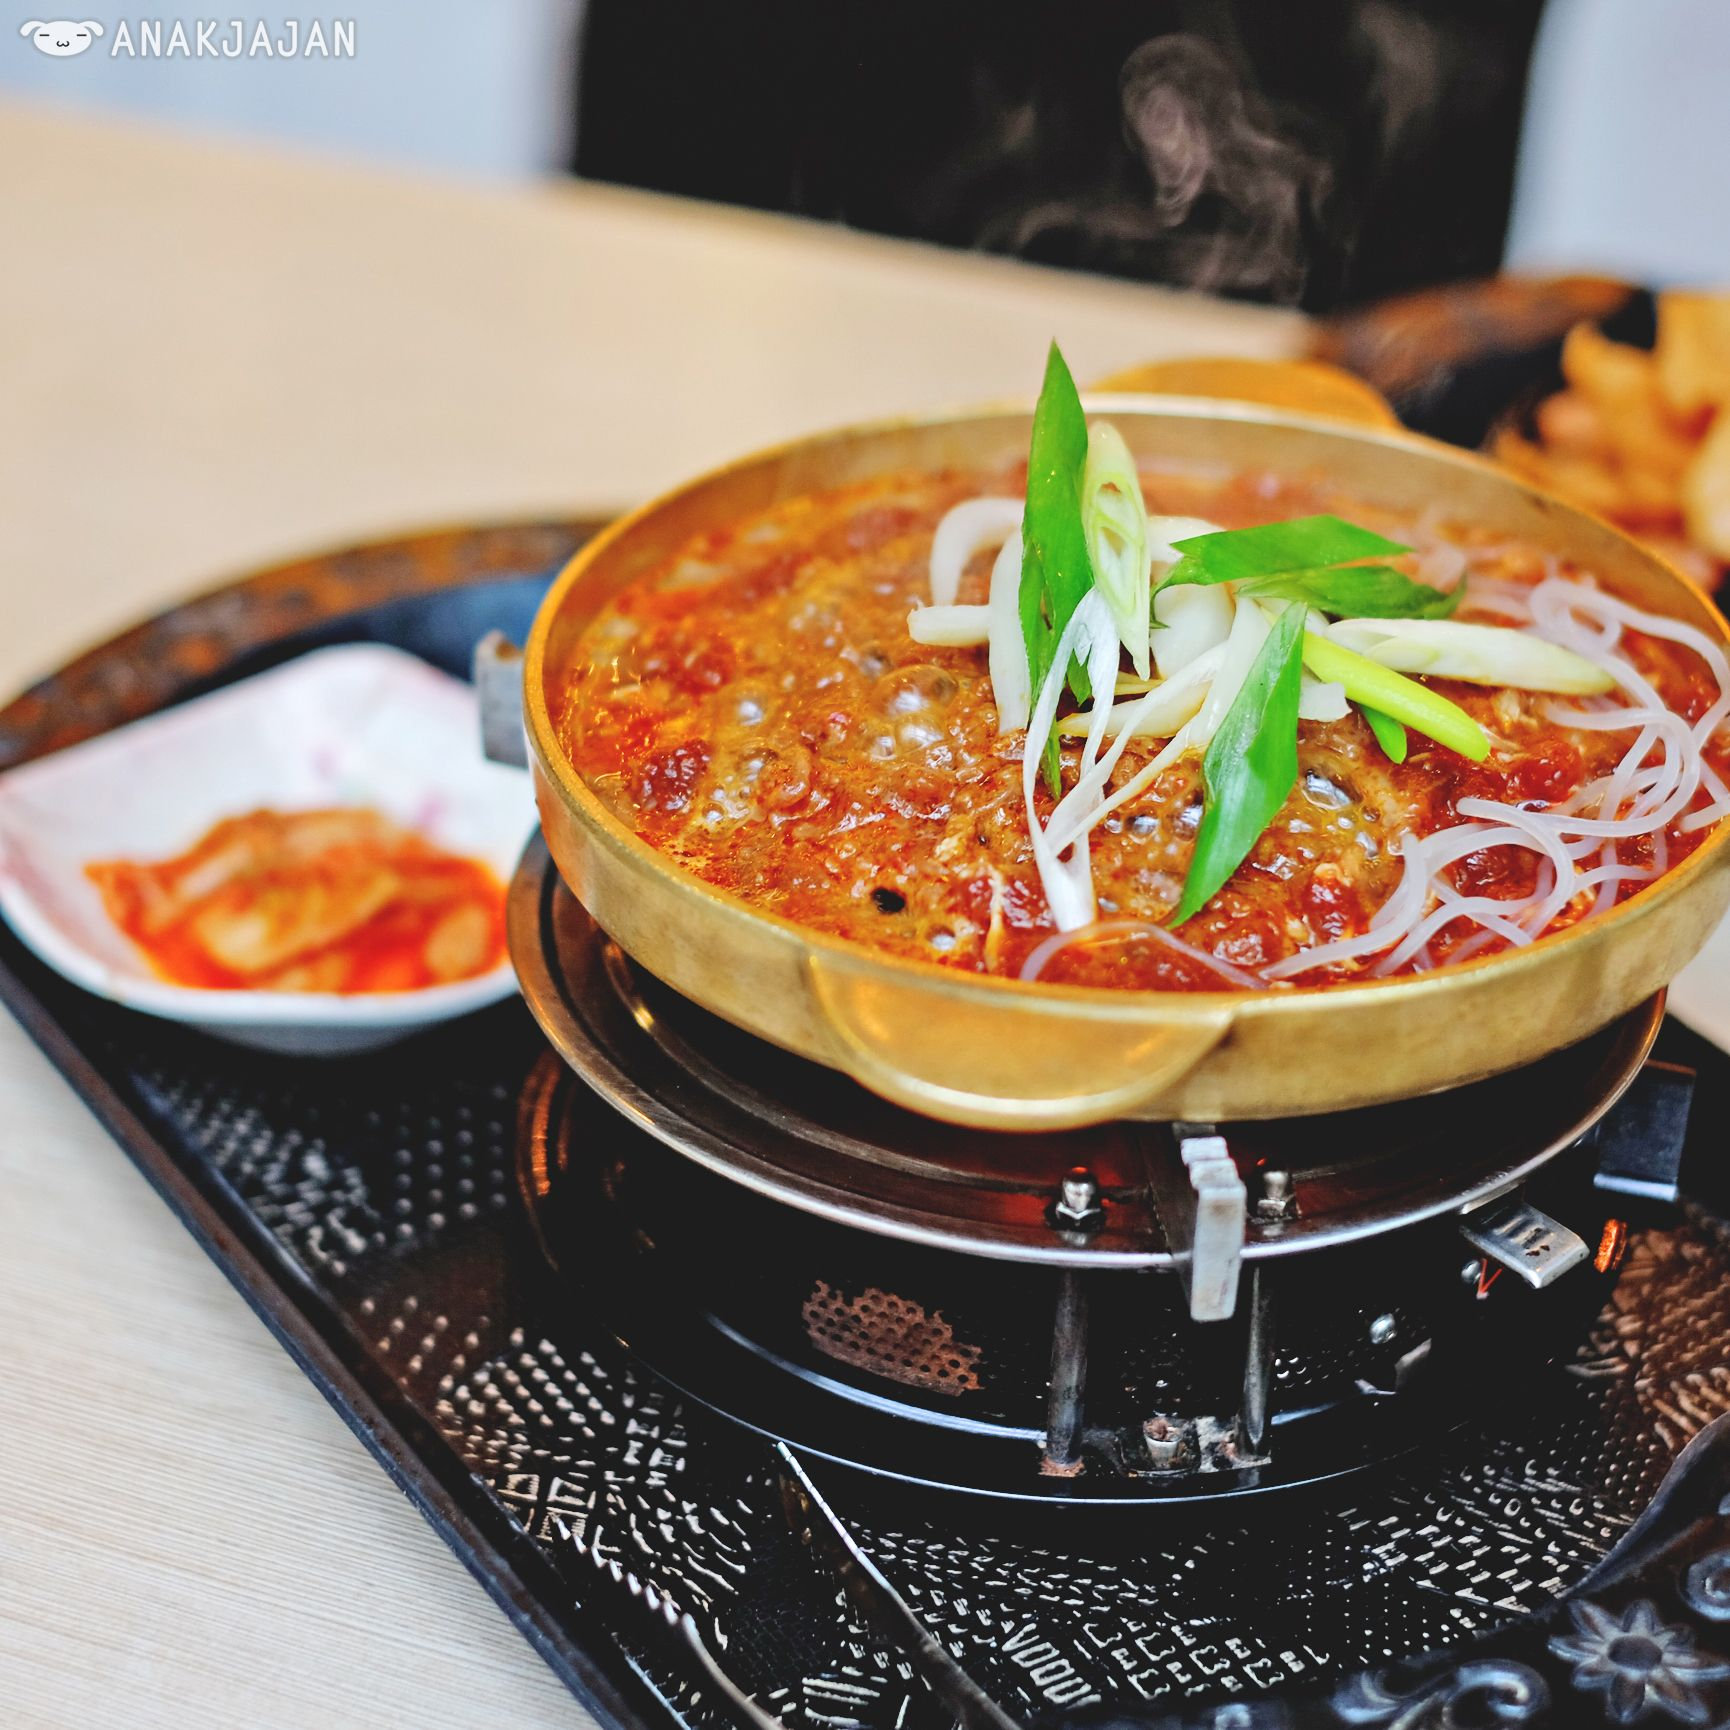 10 Restoran Korea Halal Yang Harus Kamu Coba Di Jakarta Restoran Masakan Tahu